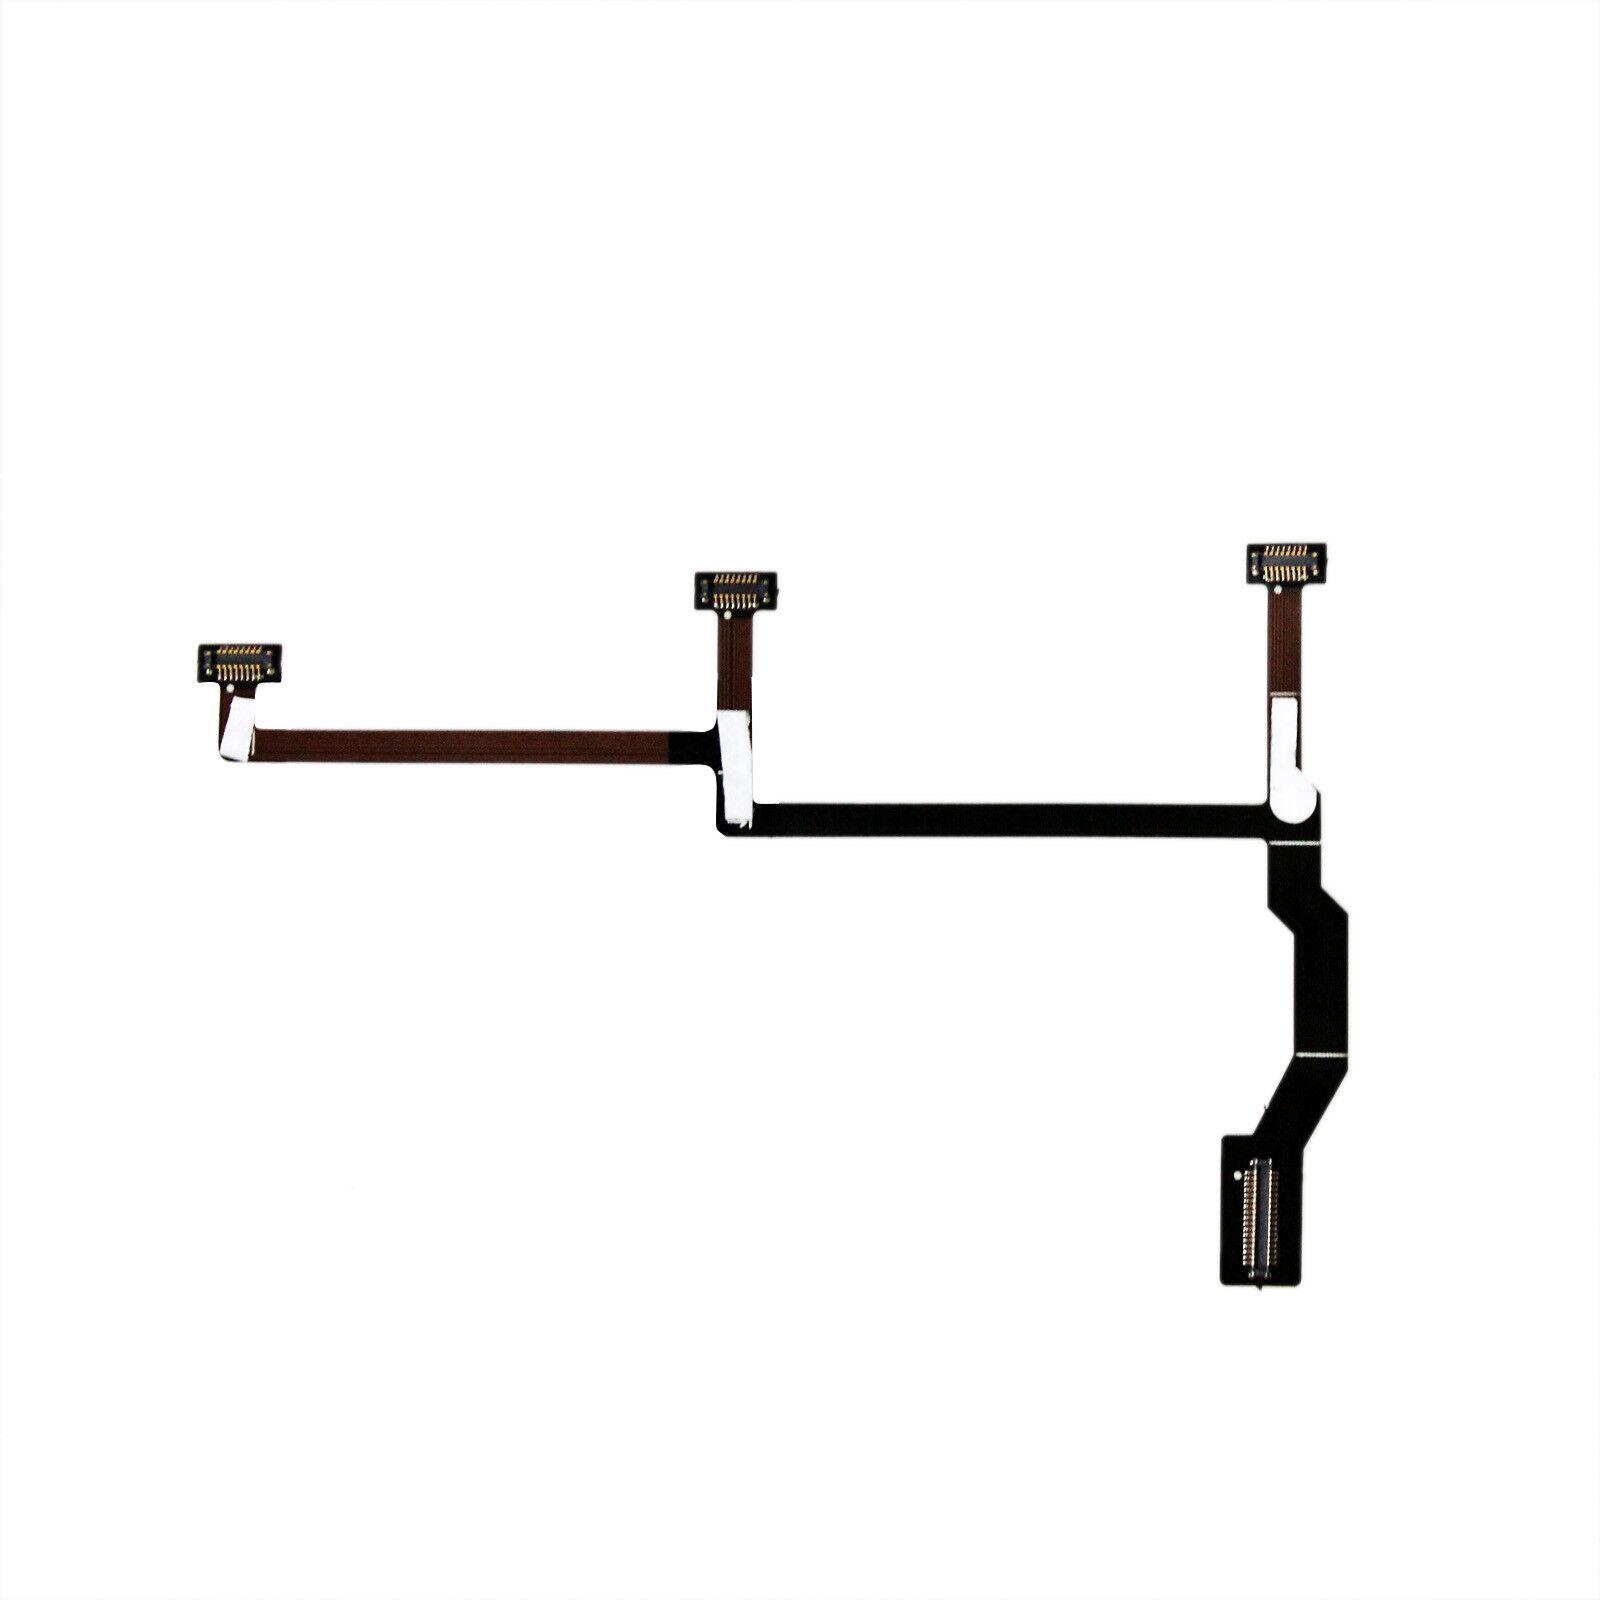 20PCS DJI Mavic Mavic Mavic Pro Flexible Gimbal Flat Ribbon Flex Cable BRe FAST HIPPING sz 529aa6